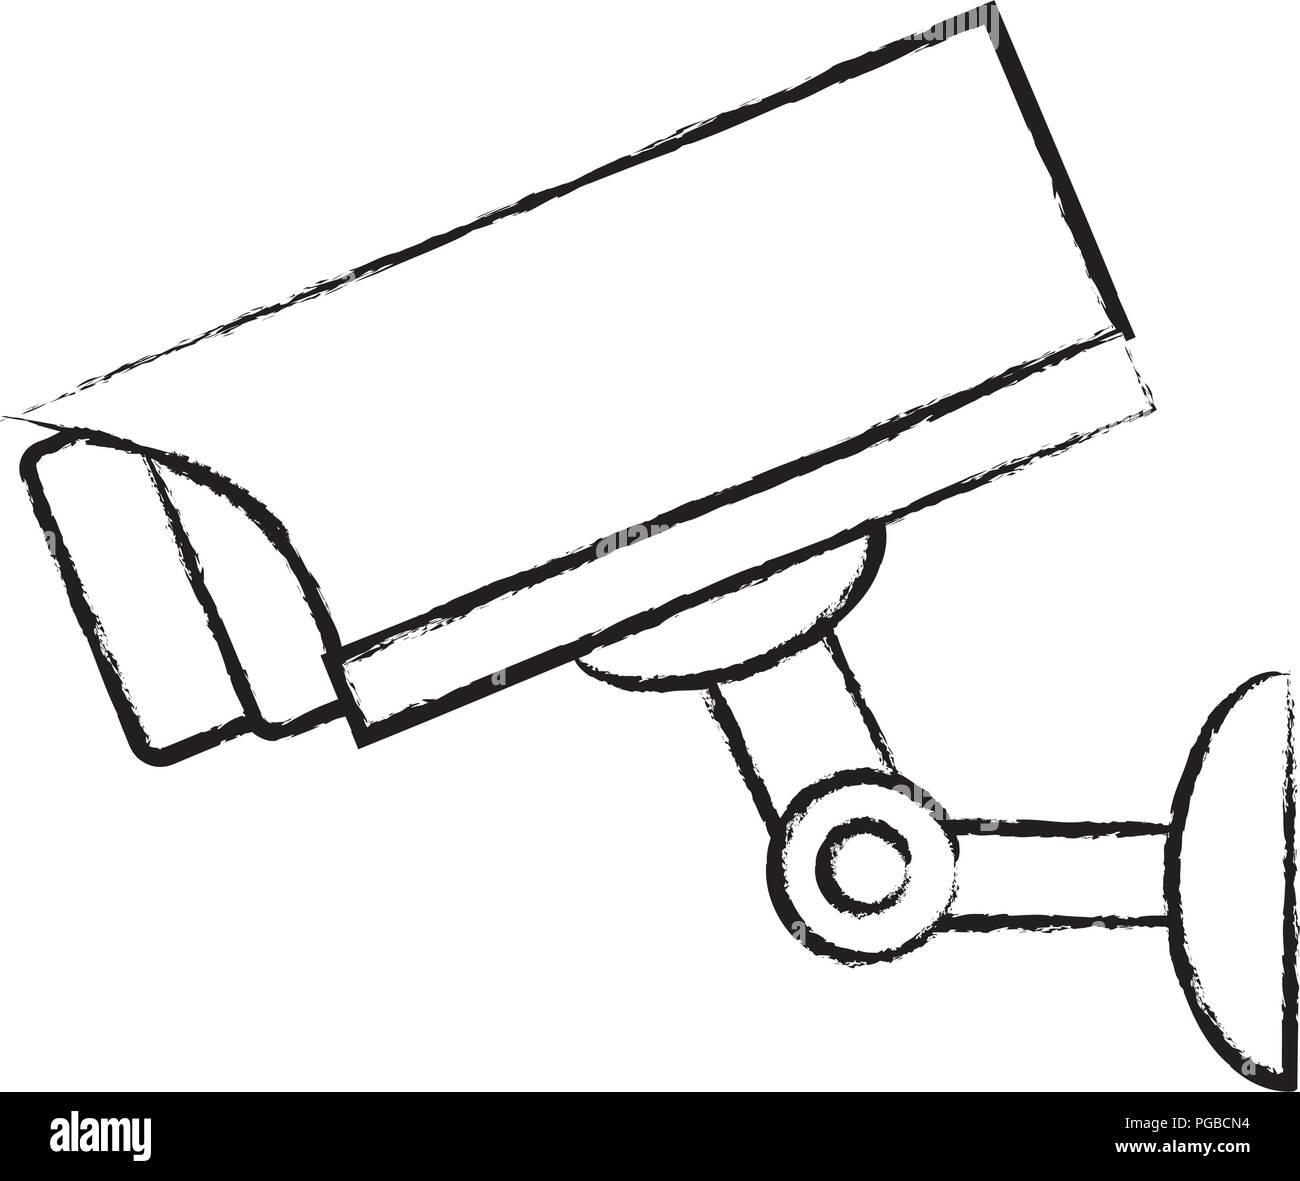 surveillance camera icon over white background, vector illustration - Stock Image